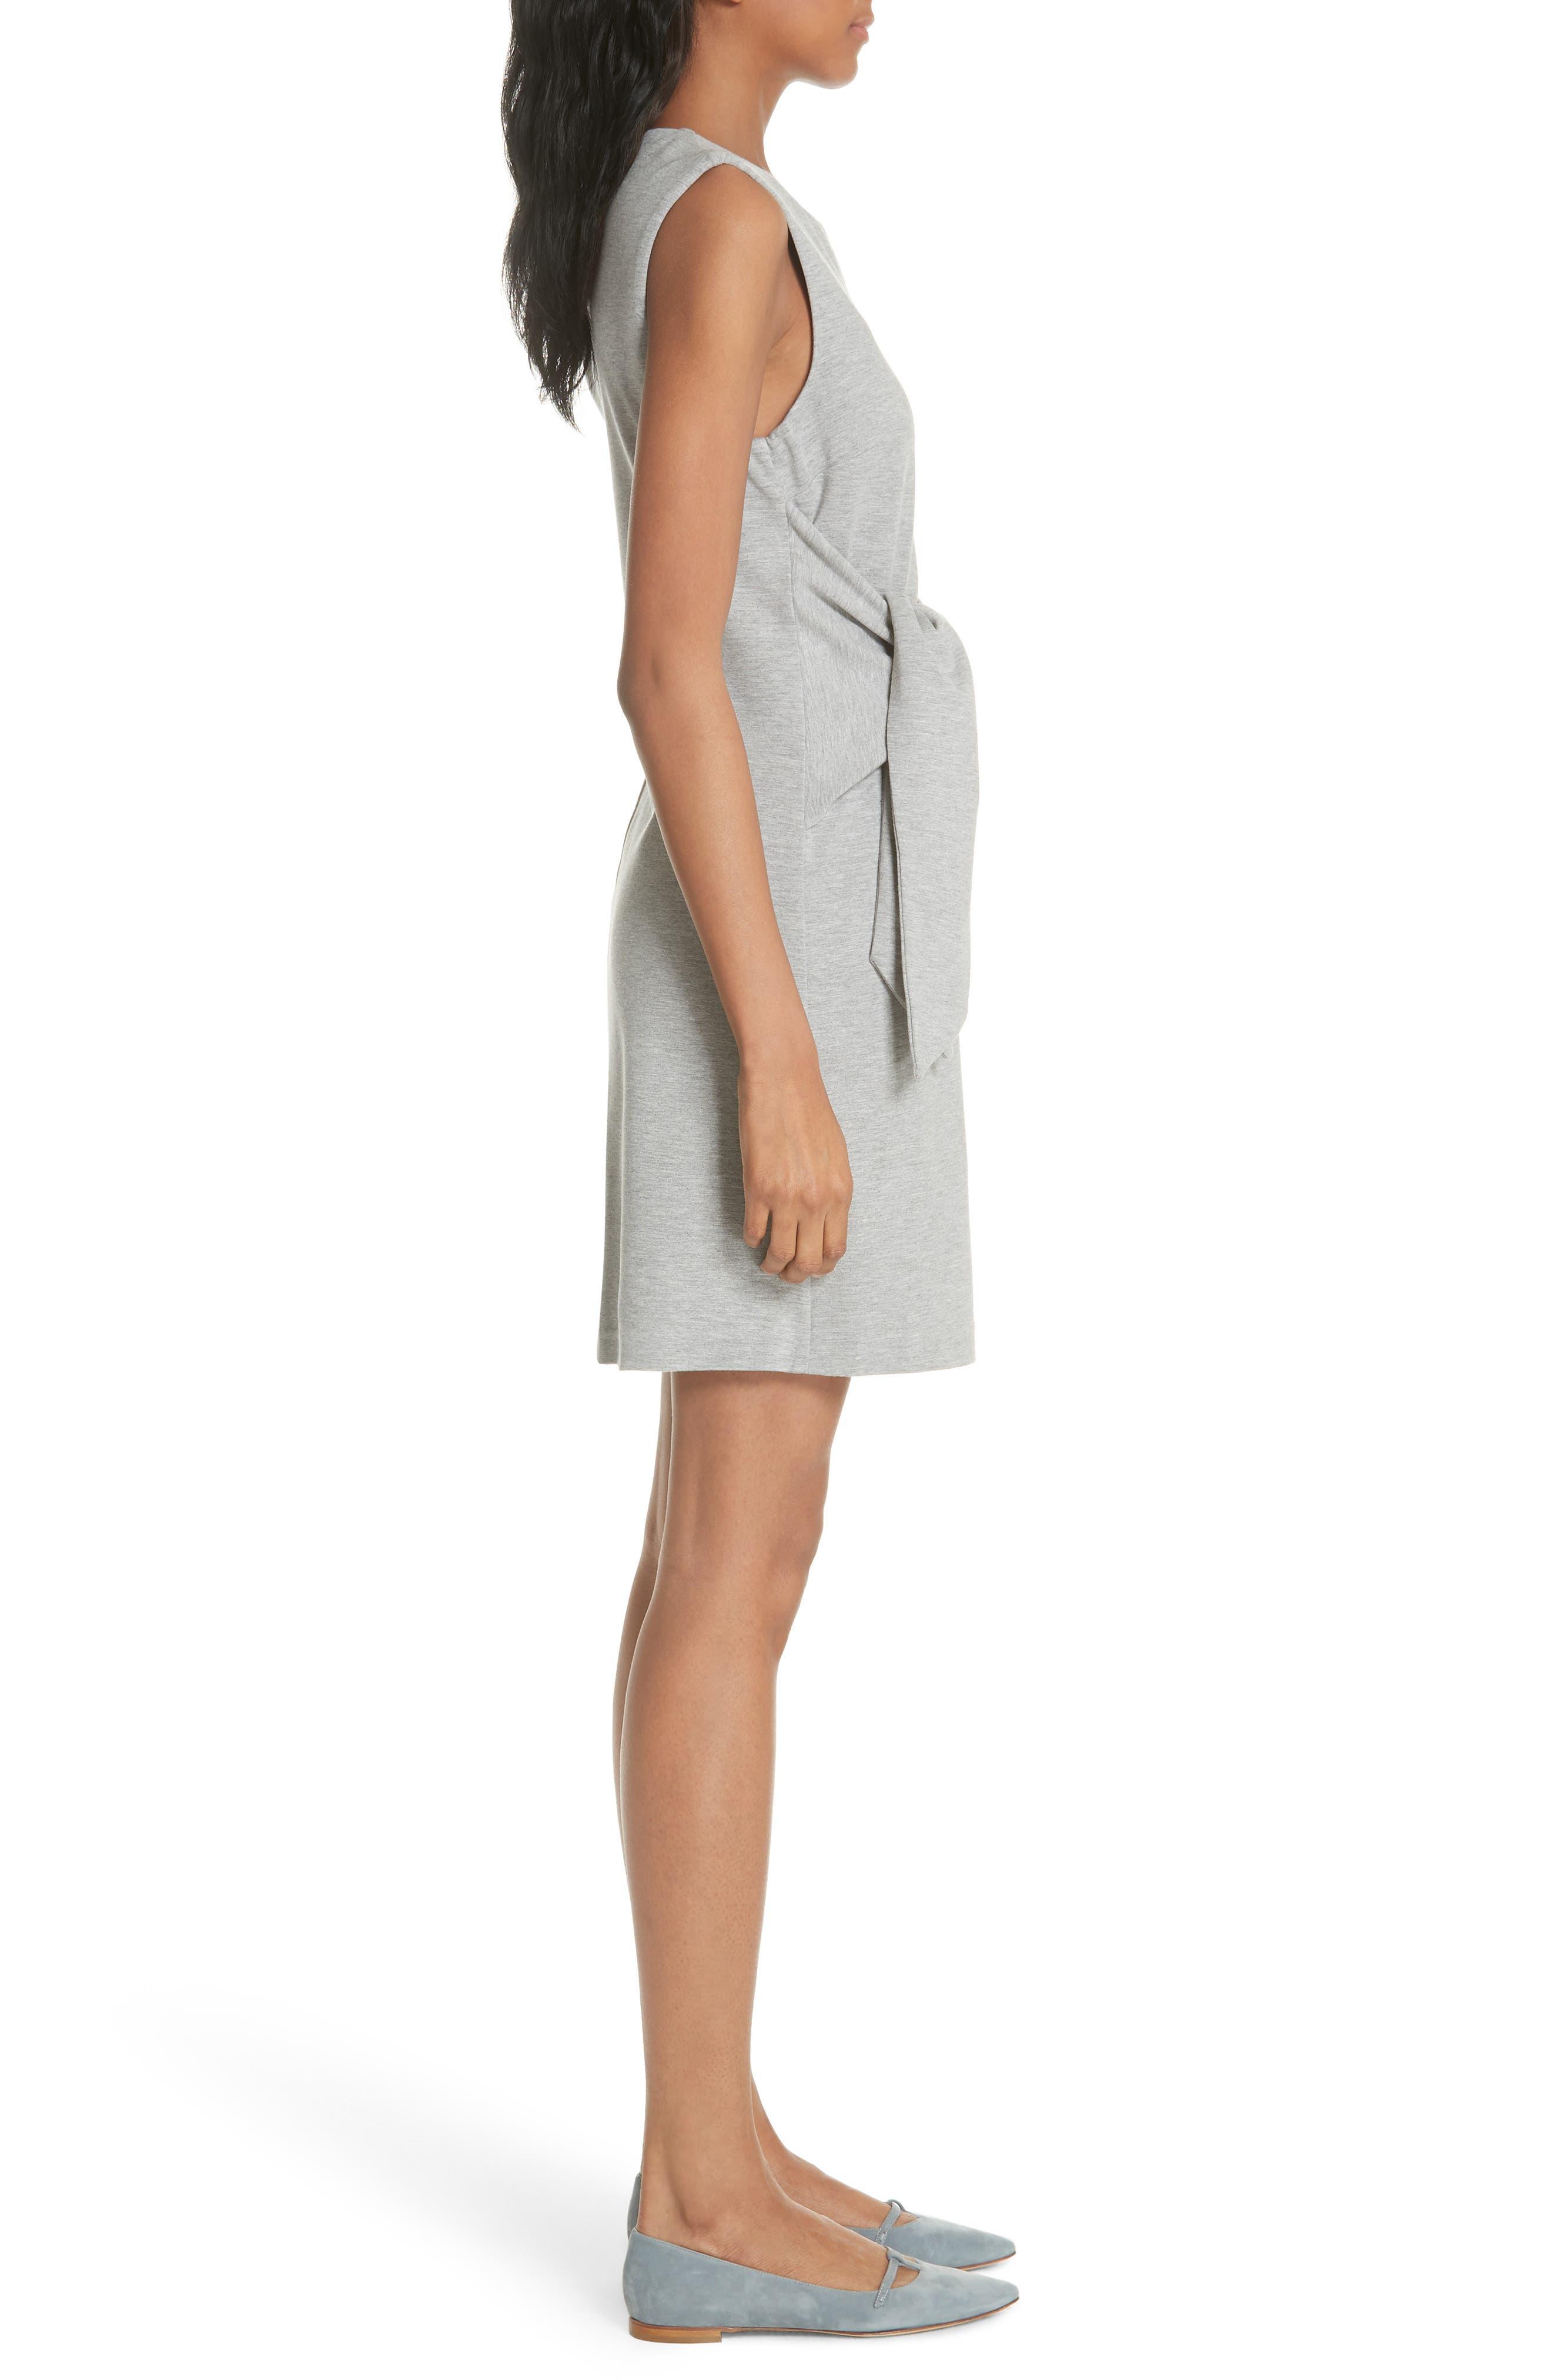 Evalina Tie Front Dress,                             Alternate thumbnail 3, color,                             Grey Marl